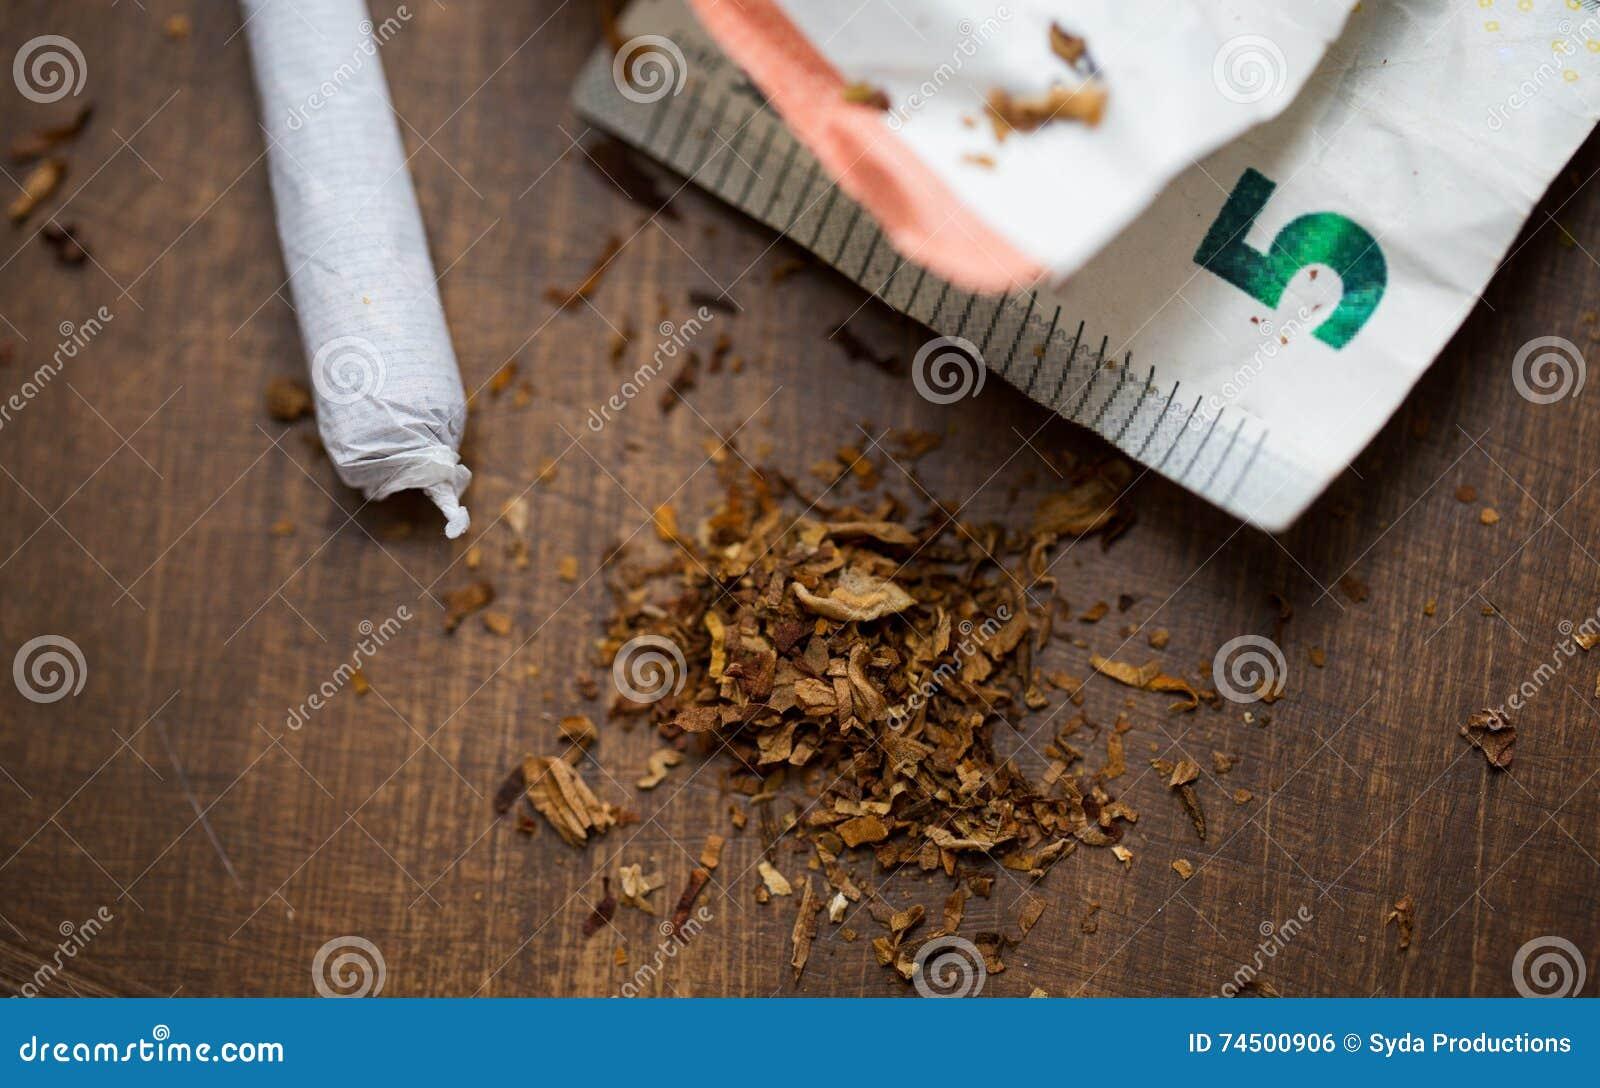 addiction and smoking marijuana plays Will legalized marijuana affect addiction  the stigma of smoking marijuana  the fact that there is no consensus on whether marijuana is addictive also plays.